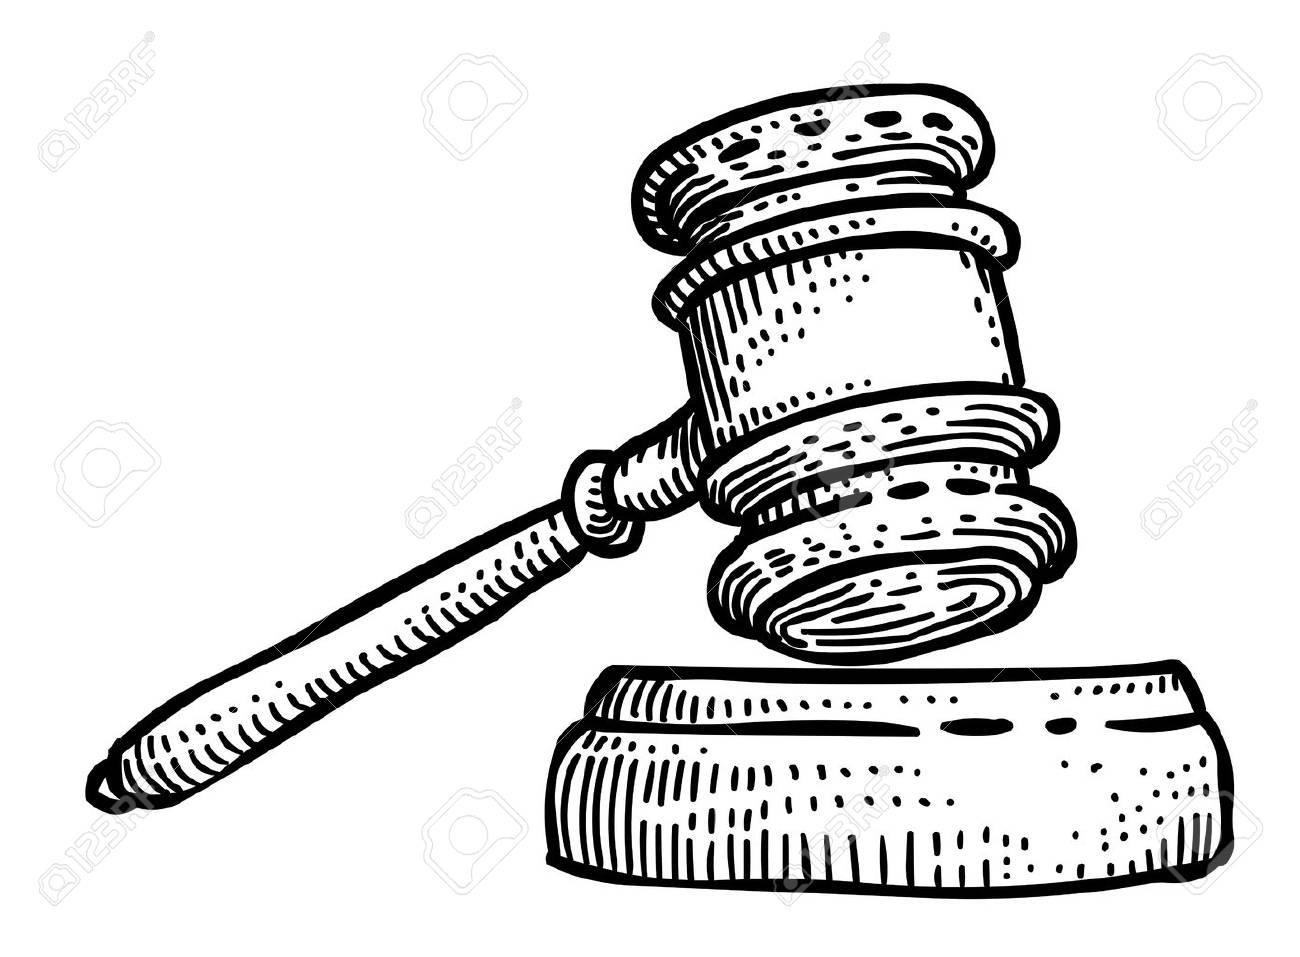 Cartoon image of law icon judge gavel symbol royalty free cliparts judge gavel symbol stock vector 79004381 buycottarizona Gallery